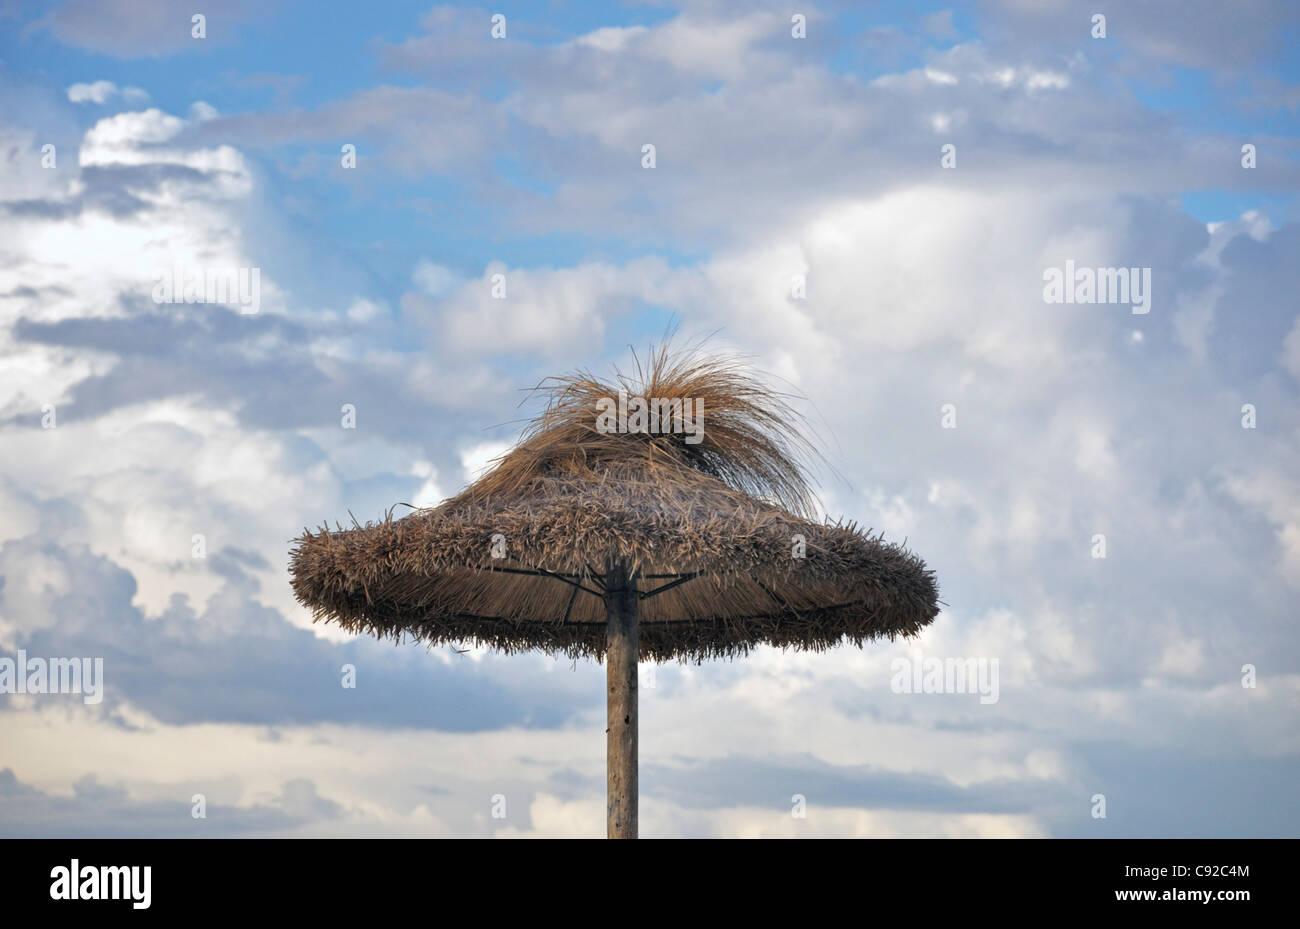 Straw umbrella against cloudy sky, Mallorca, Spain, Europe - Stock Image